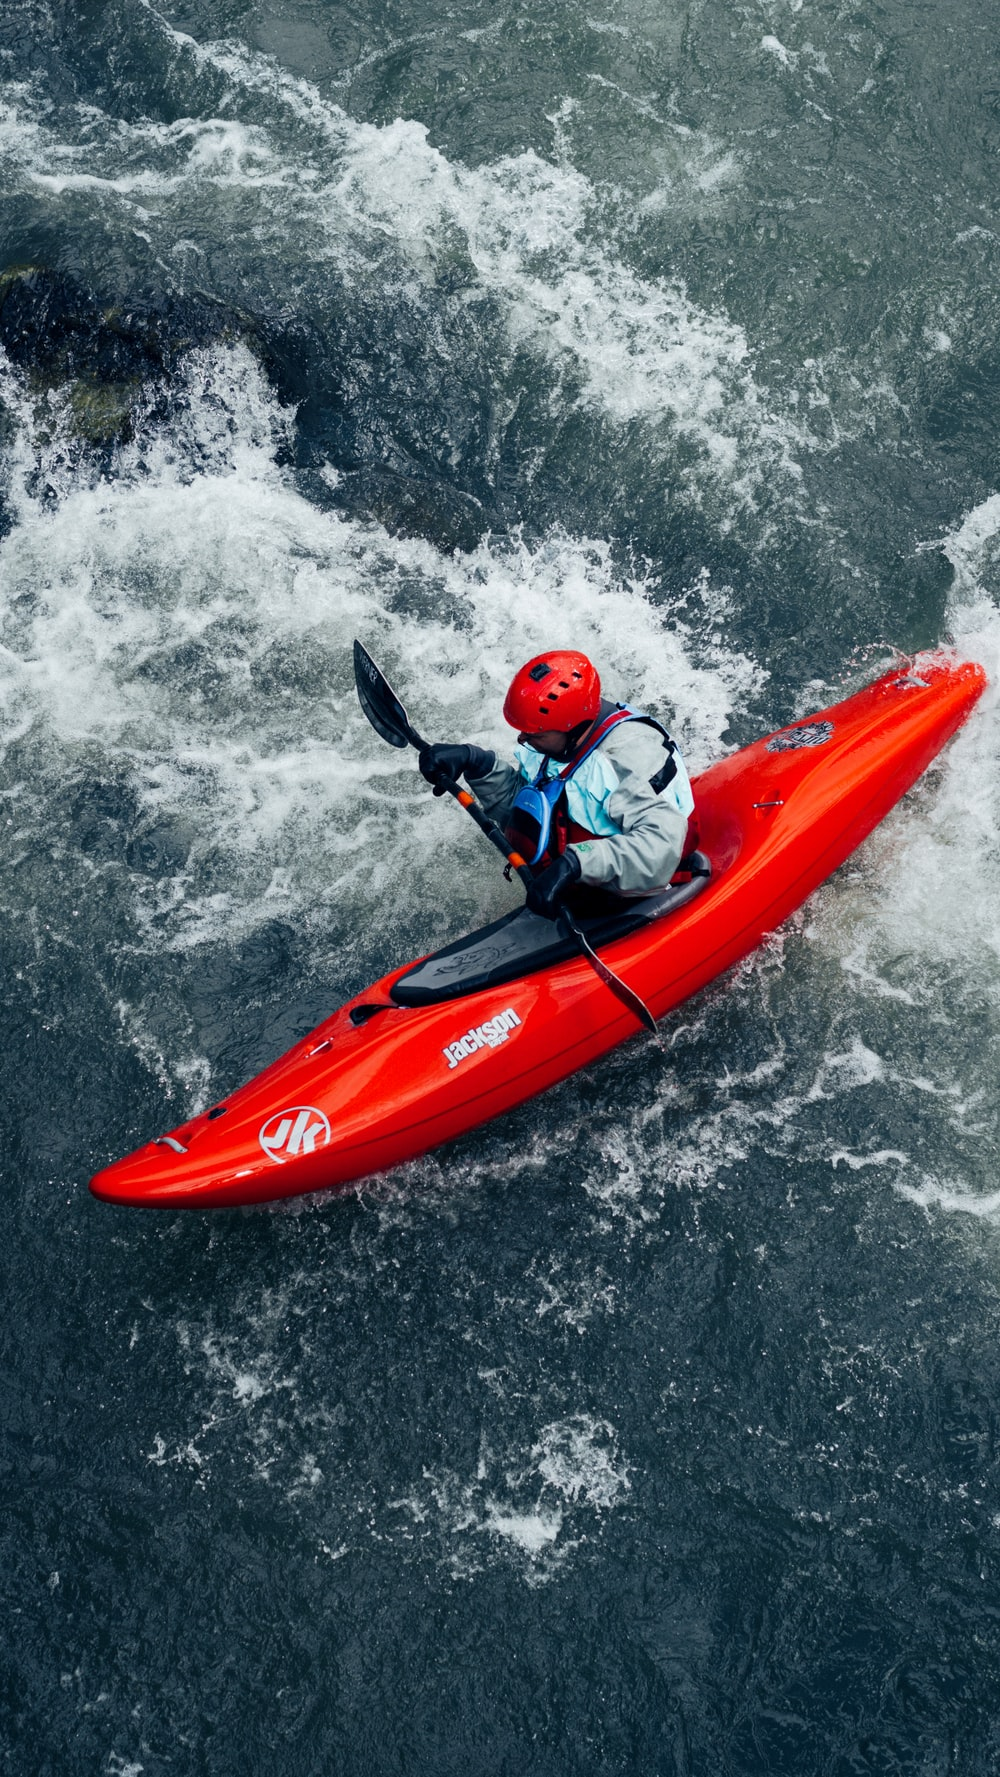 man in red and black wet suit riding orange kayak on water